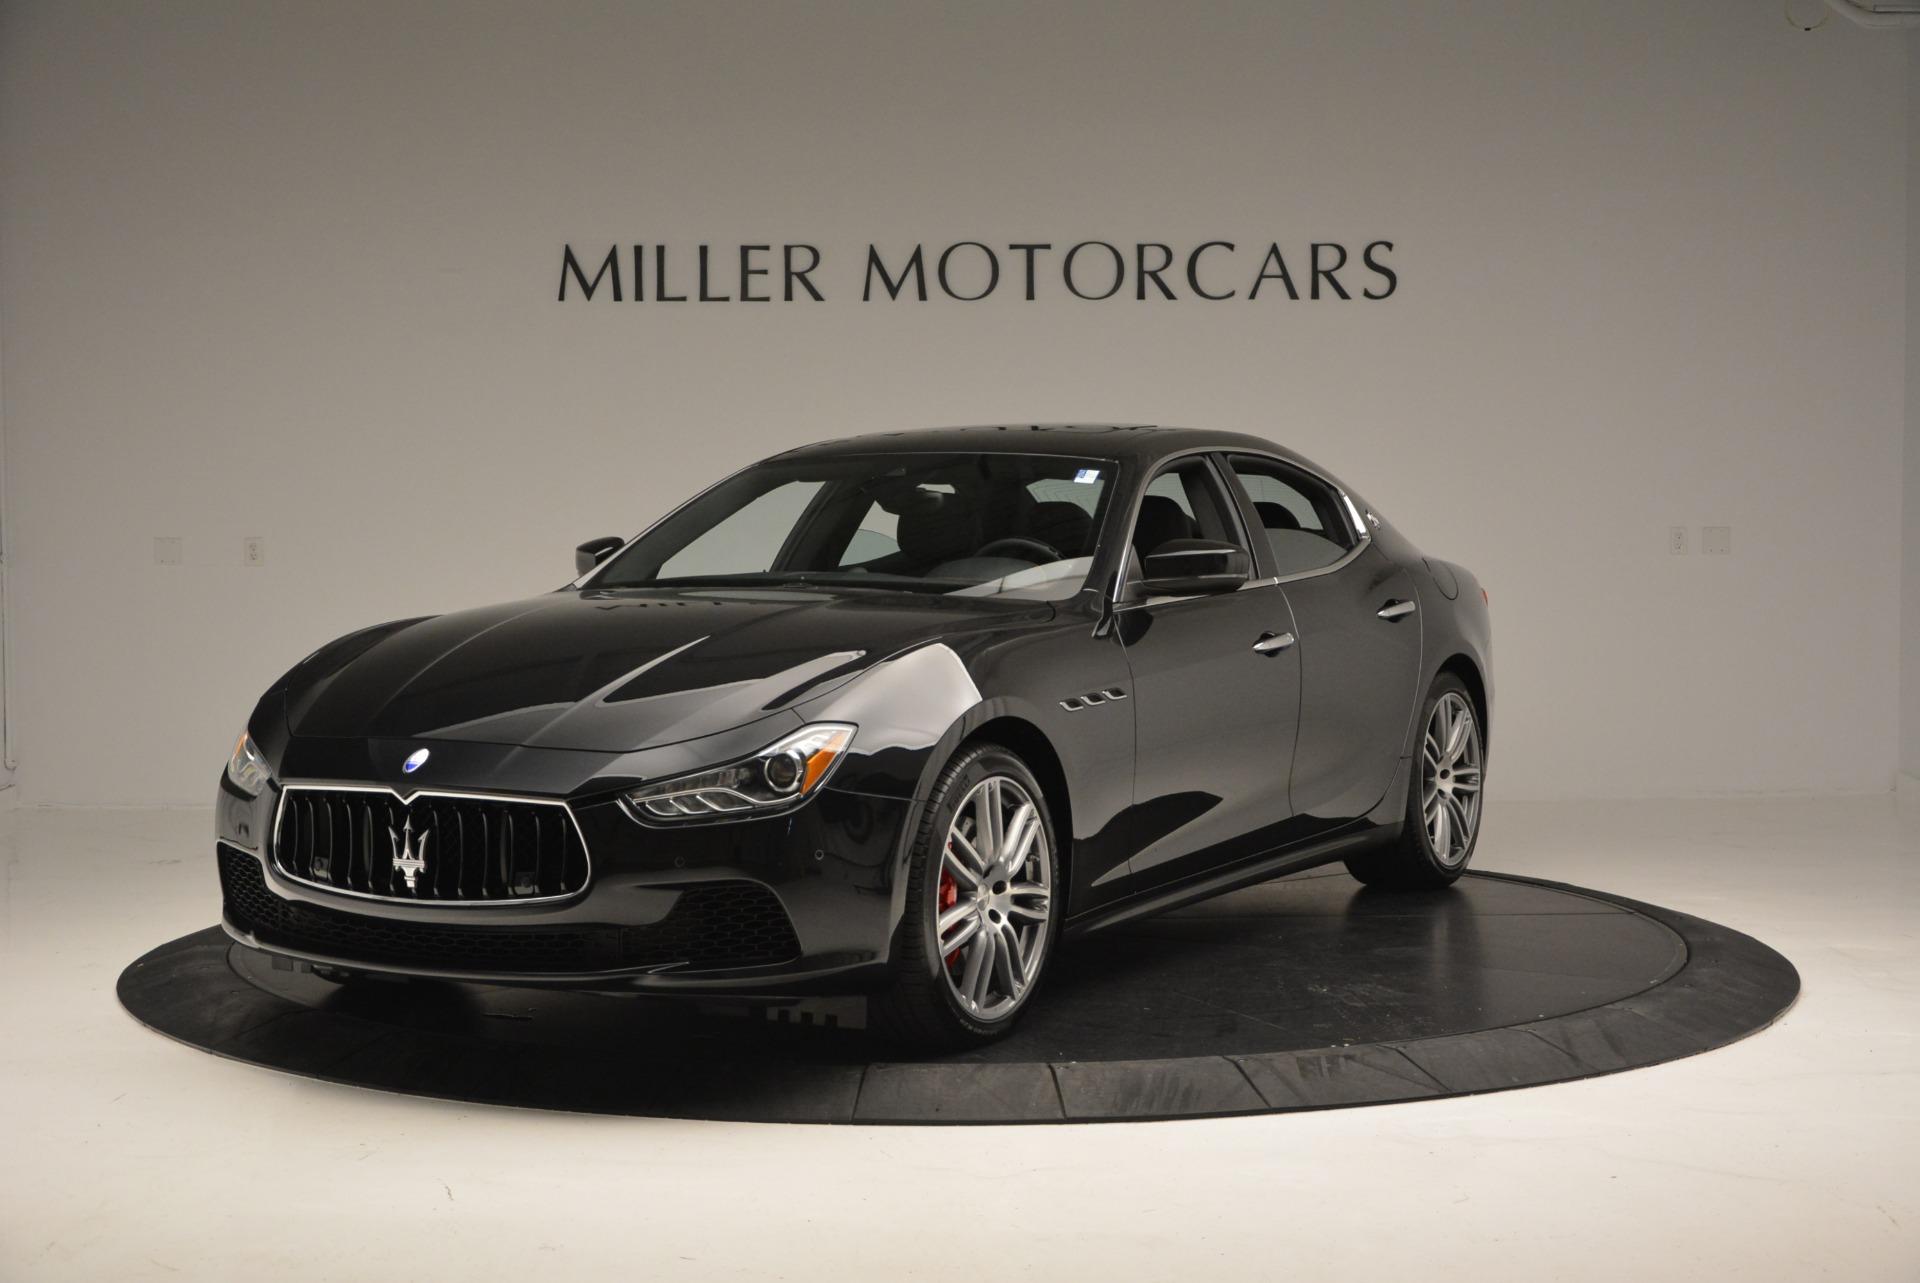 New 2017 Maserati Ghibli S Q4 For Sale In Greenwich, CT 604_main